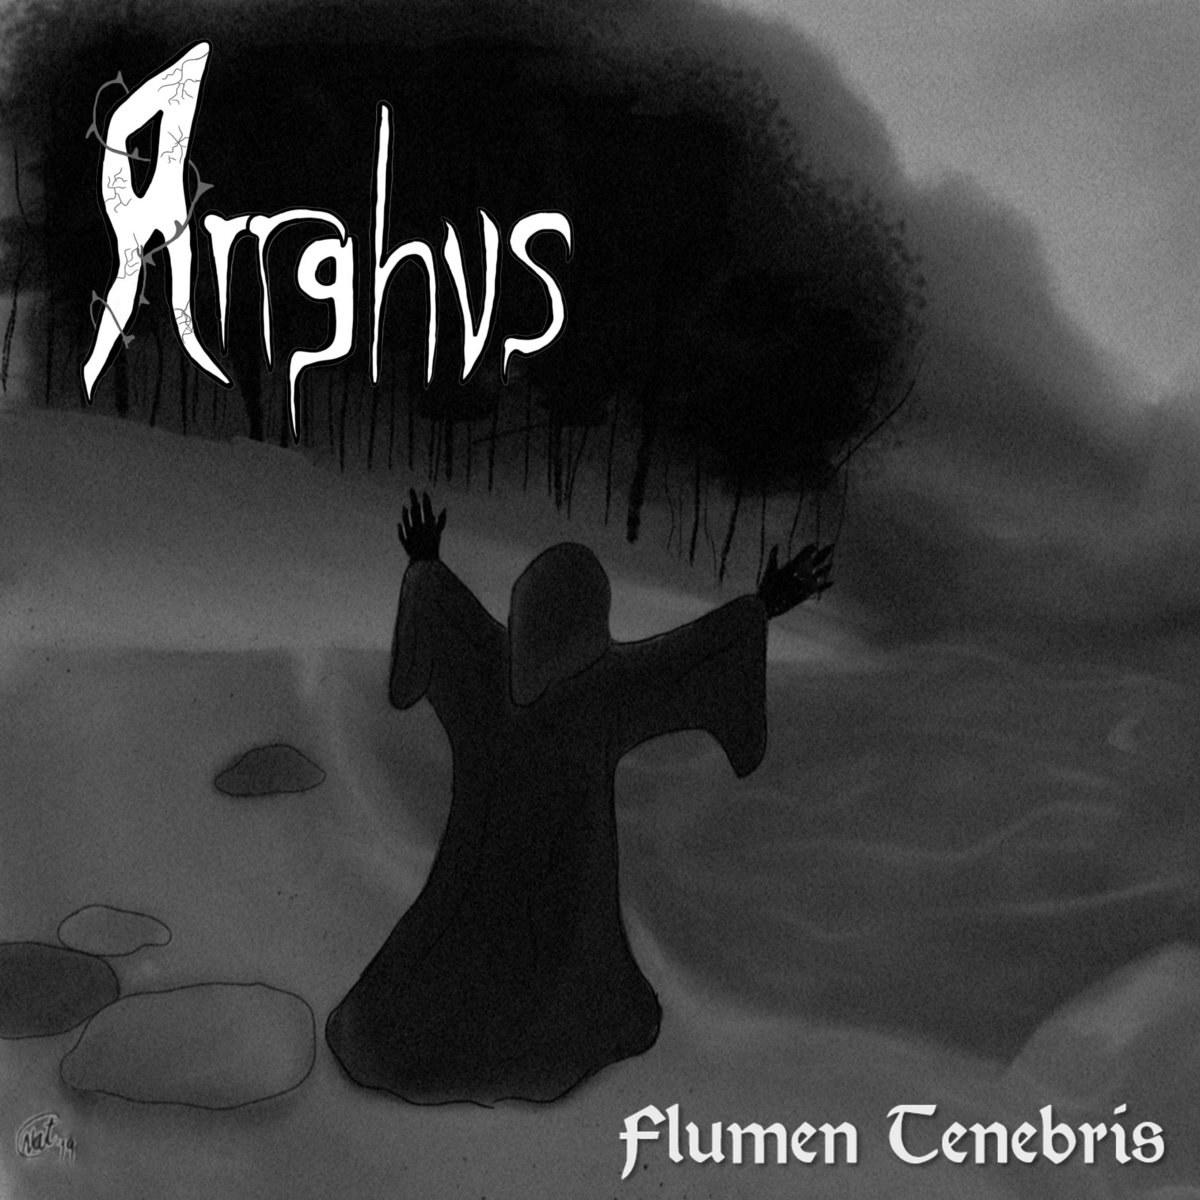 Review for Arrghus - Flumen Tenebris